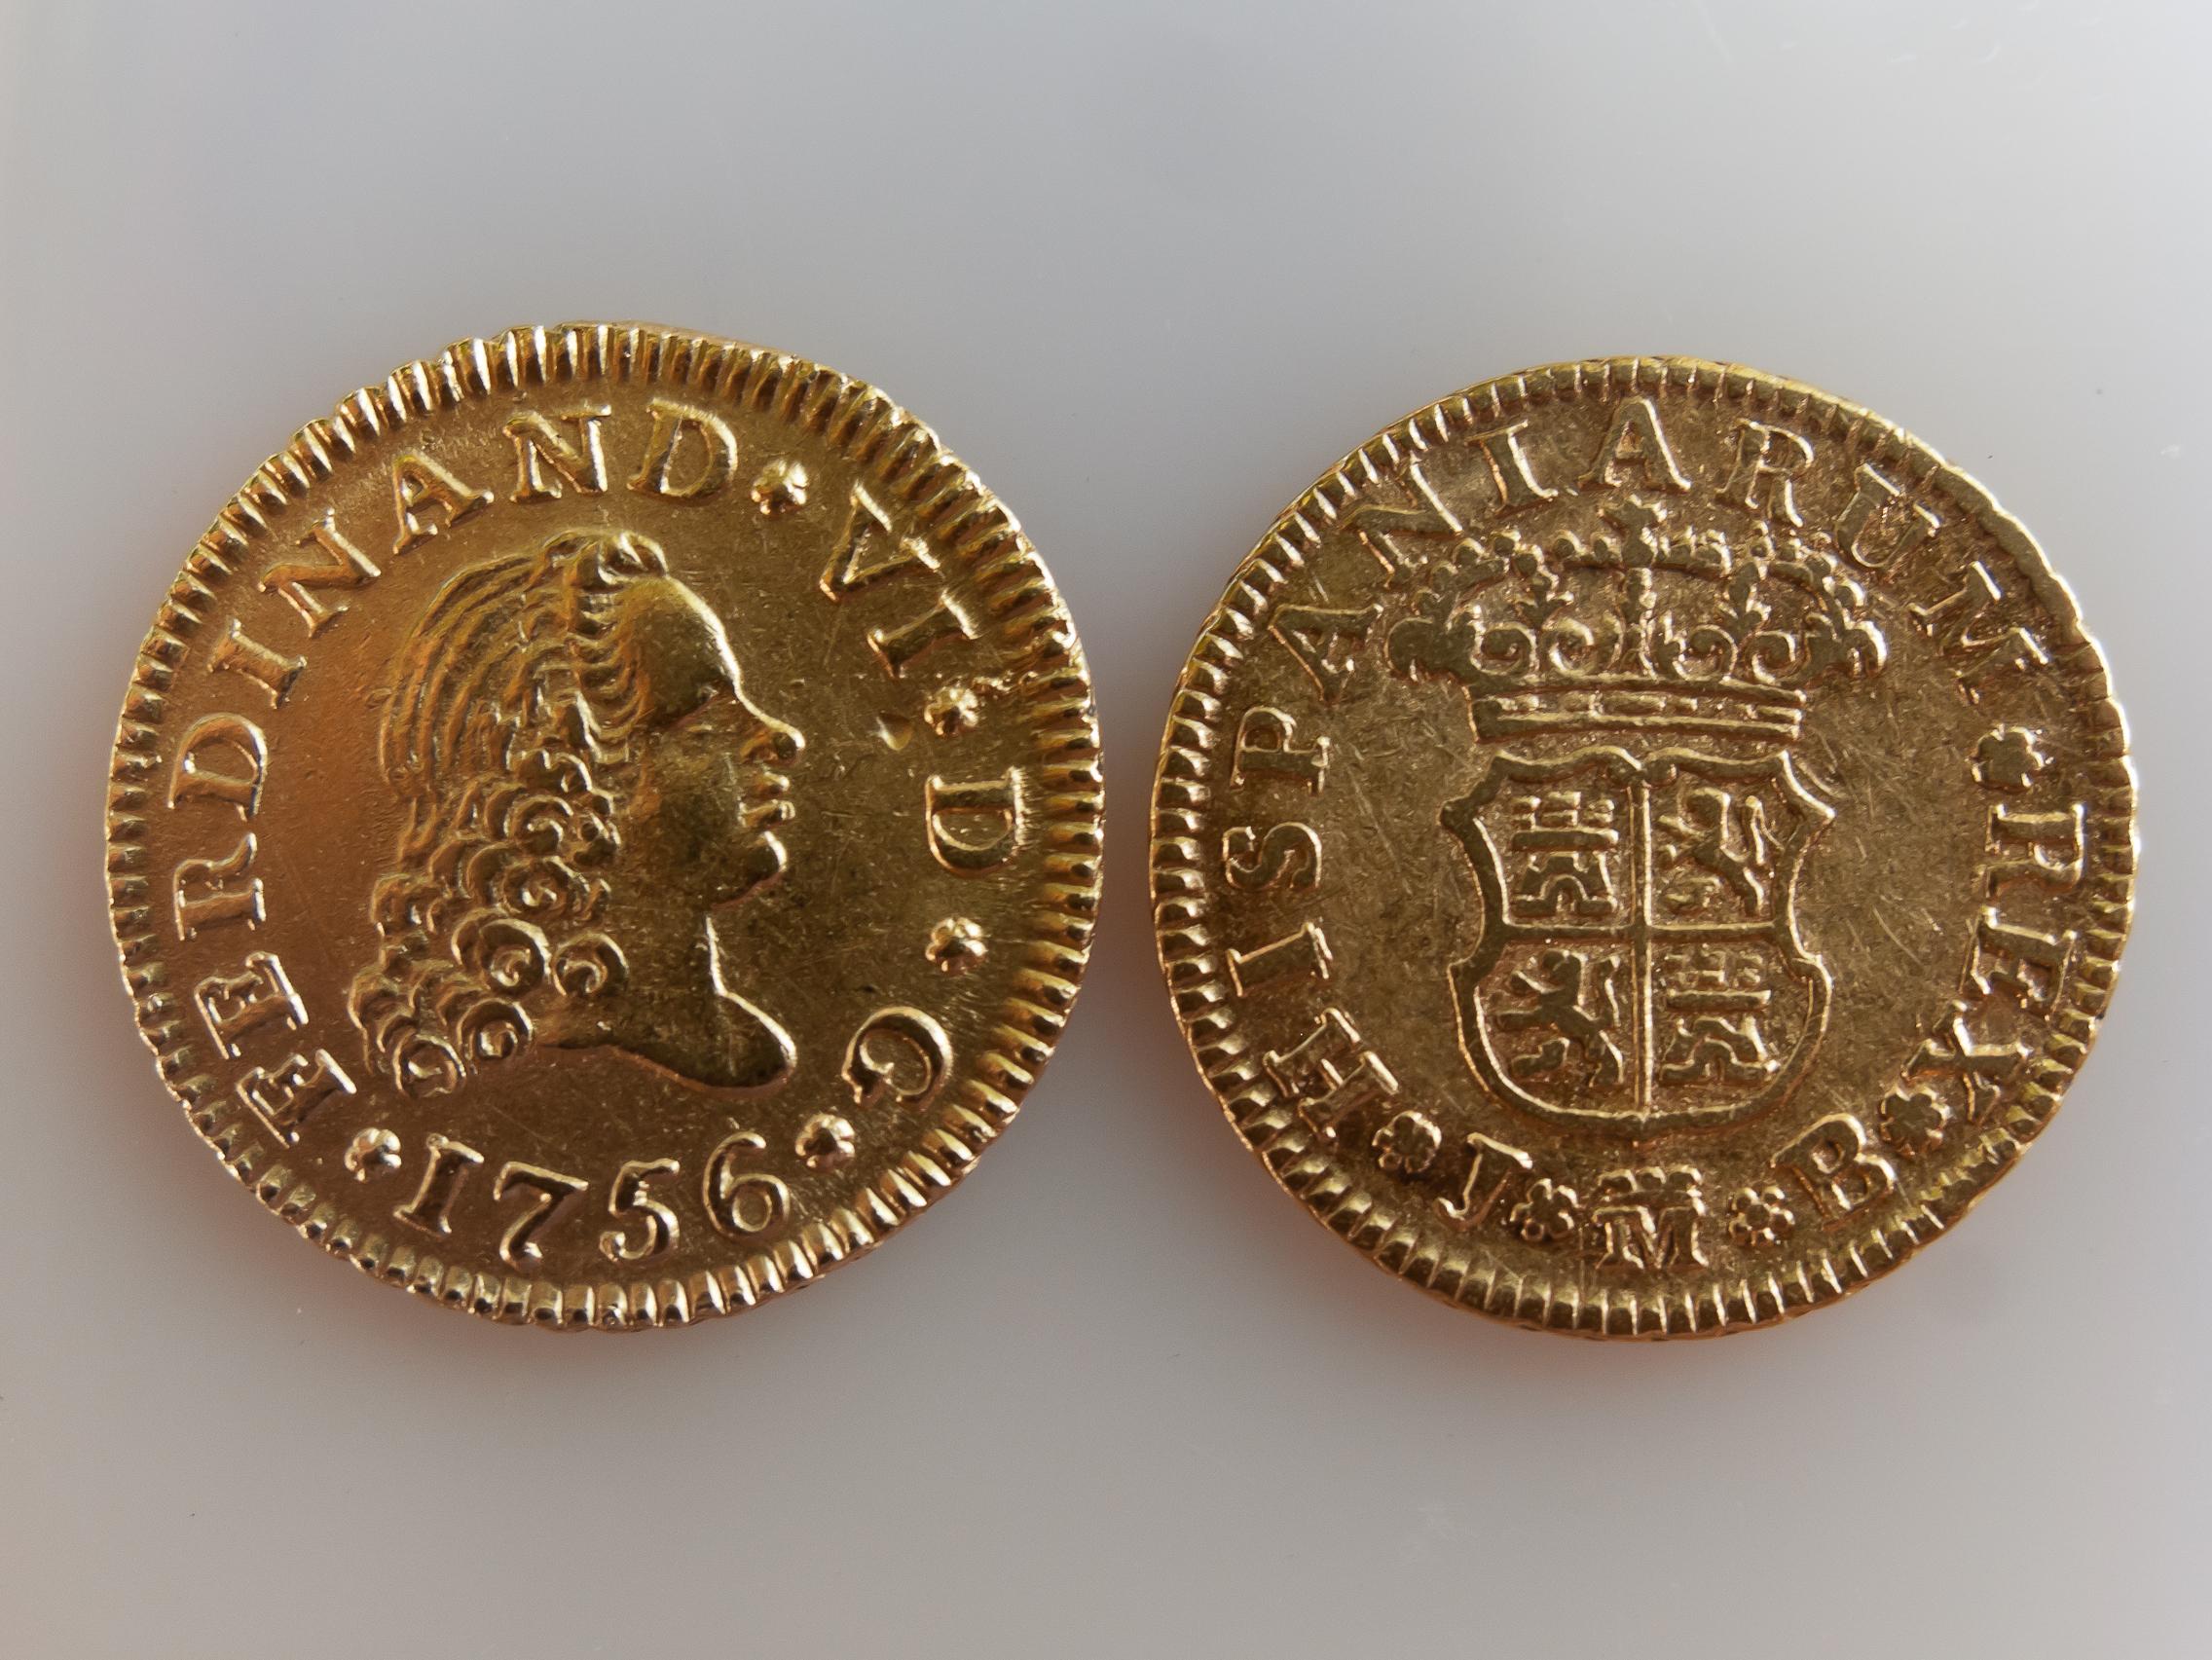 foto de File:1756 Hispaniarum rex Ferdinand VIWikimedia Commons